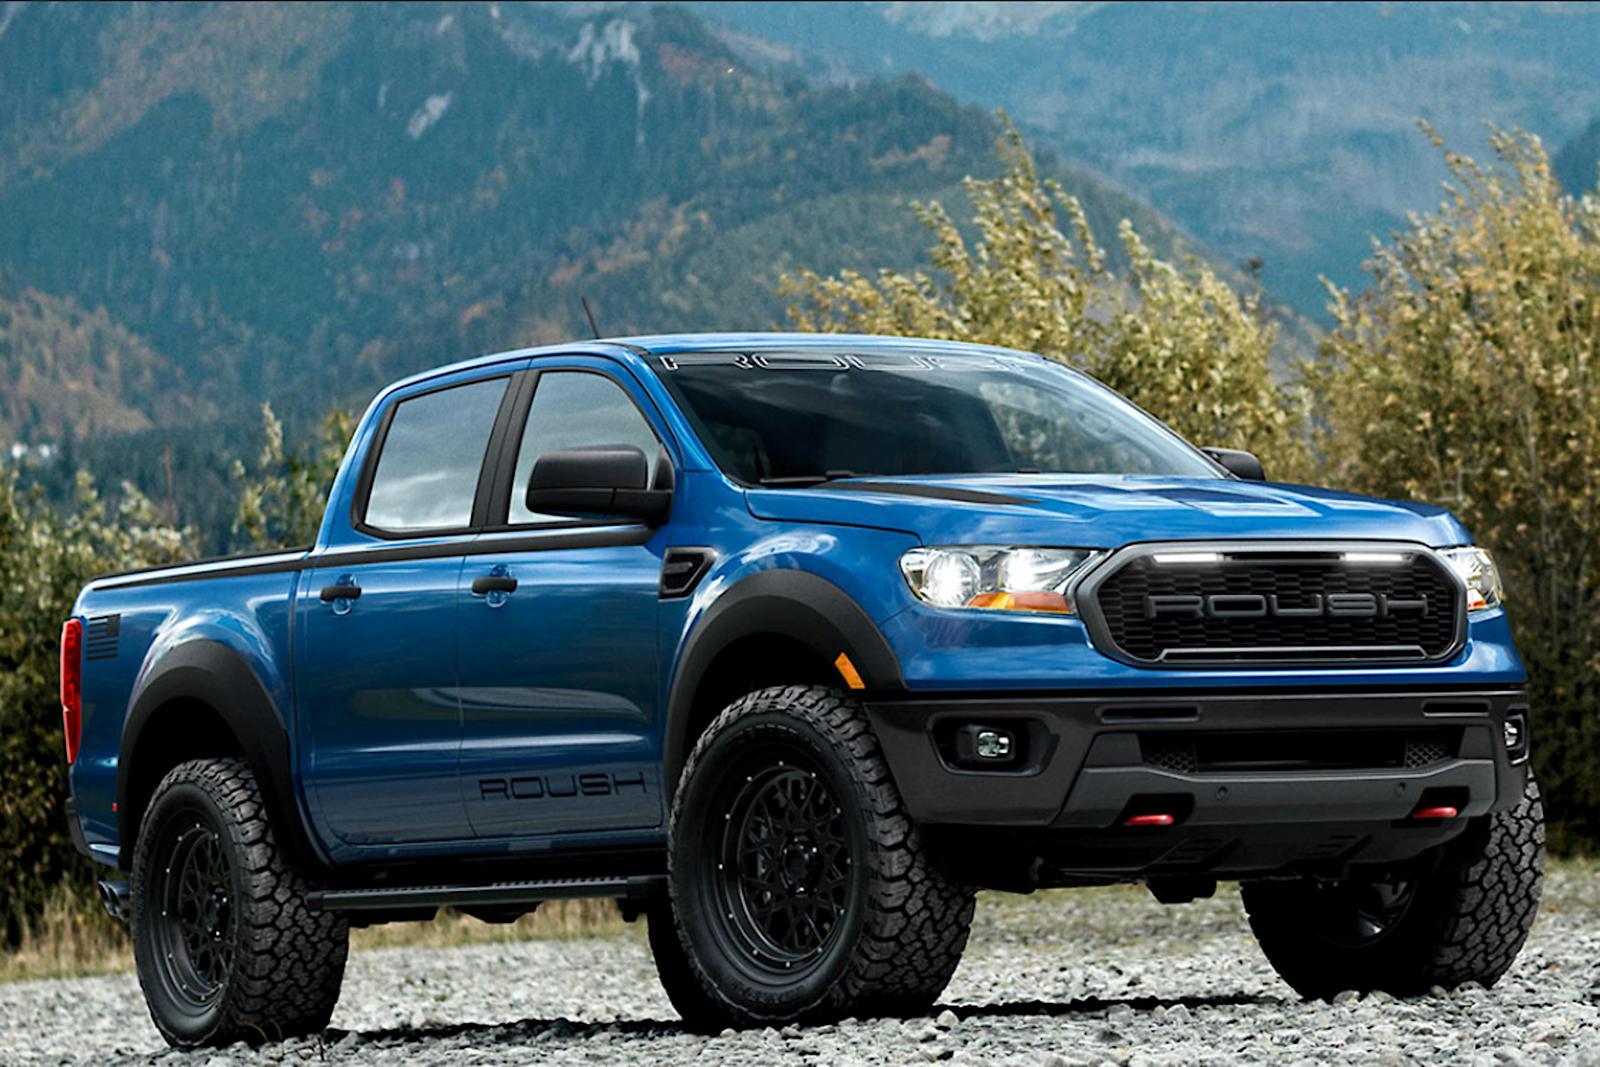 Roush Unleashes Rugged New Ford Ranger thumbnail